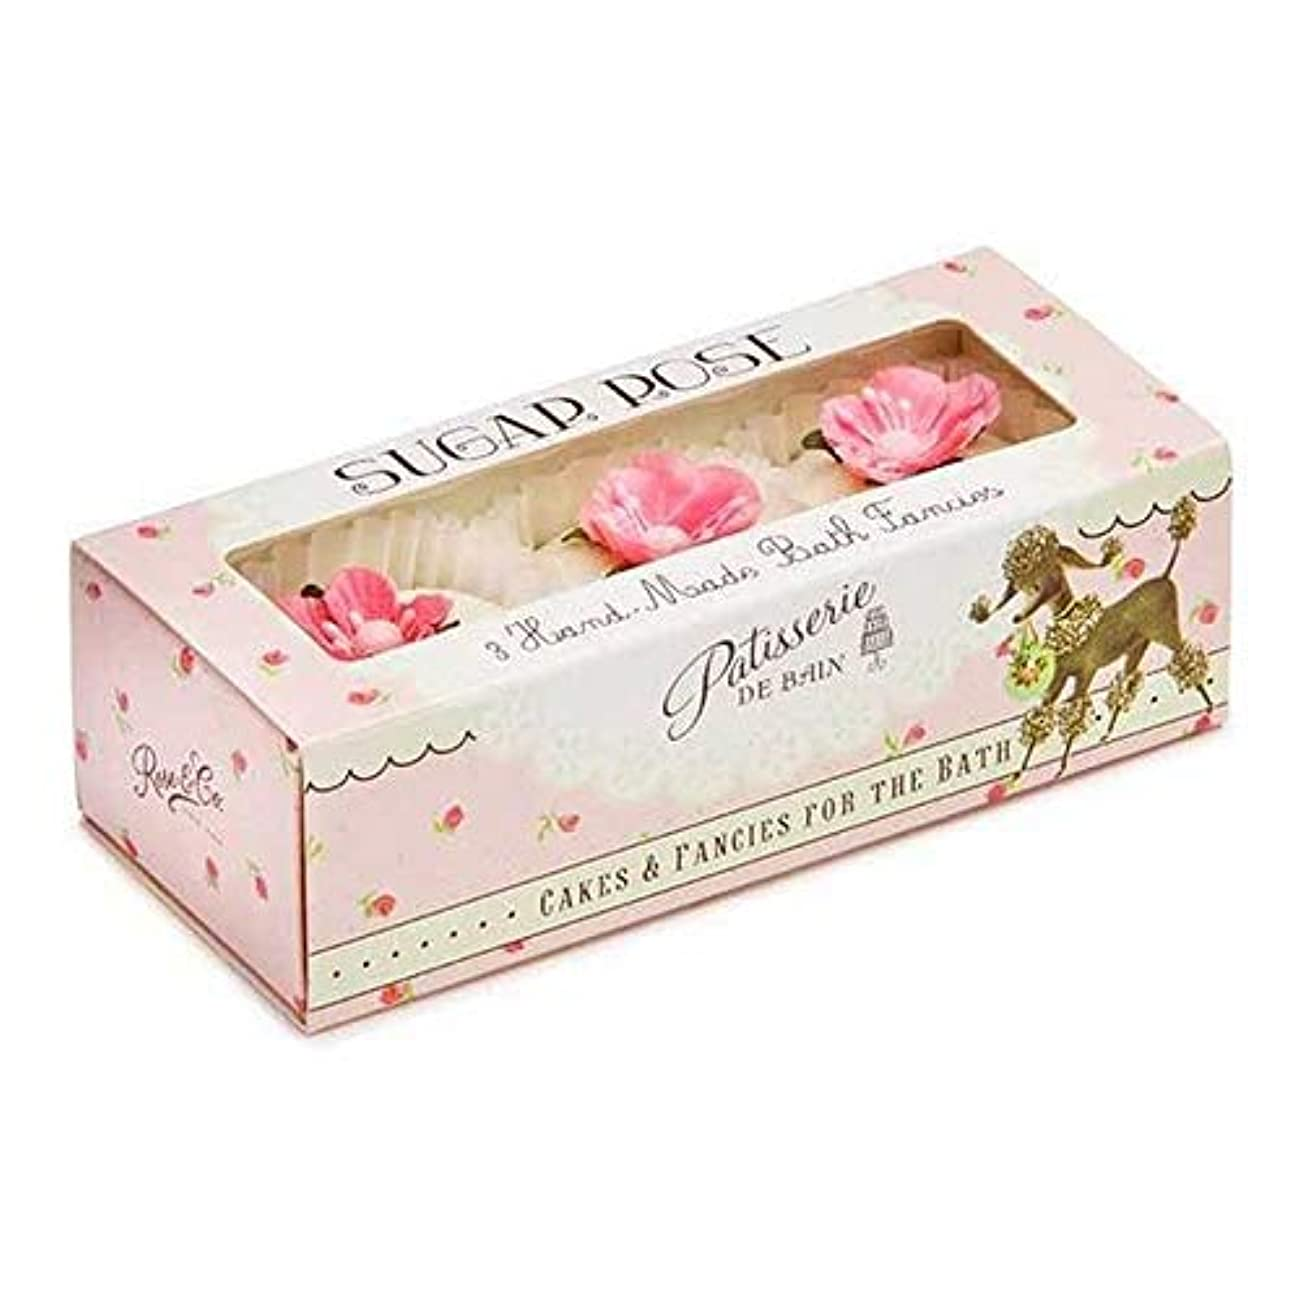 [Patisserie de Bain ] パティスリー?ド?ベイン砂糖はお風呂が3×45グラムを溶かしバラ - Patisserie de Bain Sugar Rose Bath Melts 3 x 45g [並行輸入品]